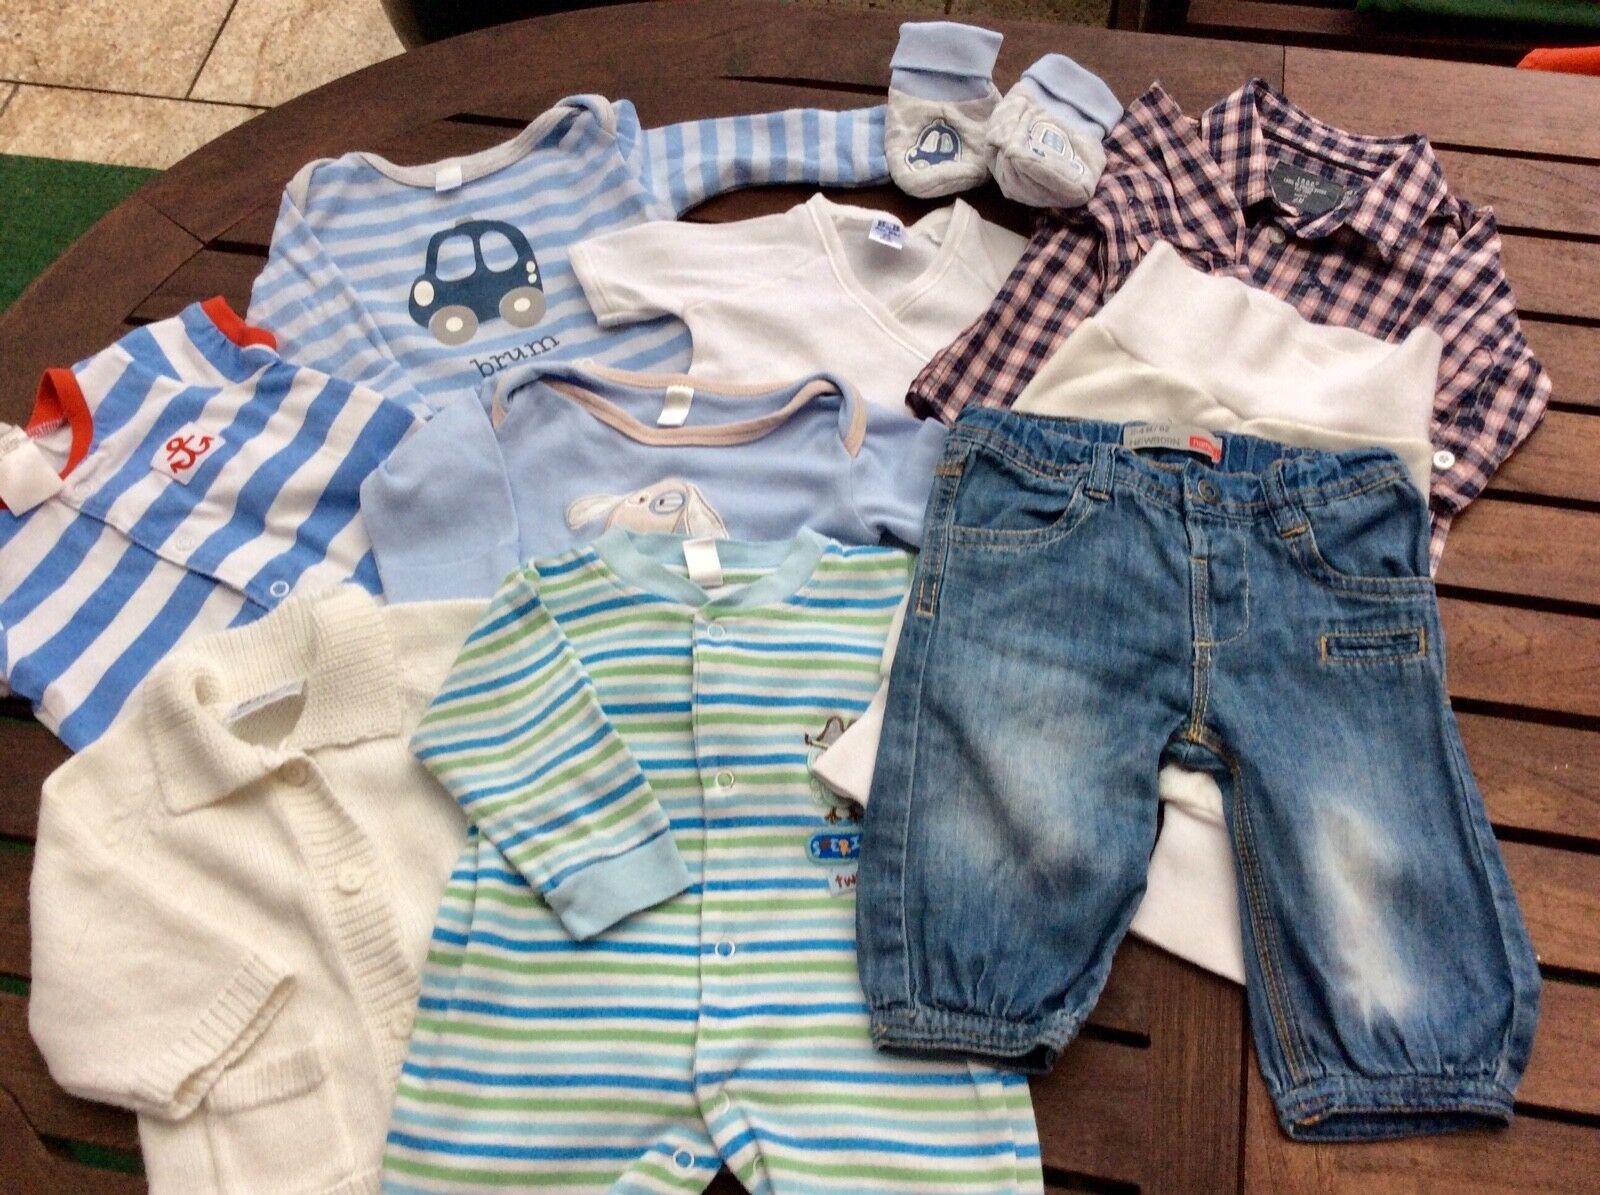 Gr. 62 Babykleidung Jungen Paket 10 Teile H&M, okay, C&A, Bekleidungspaket